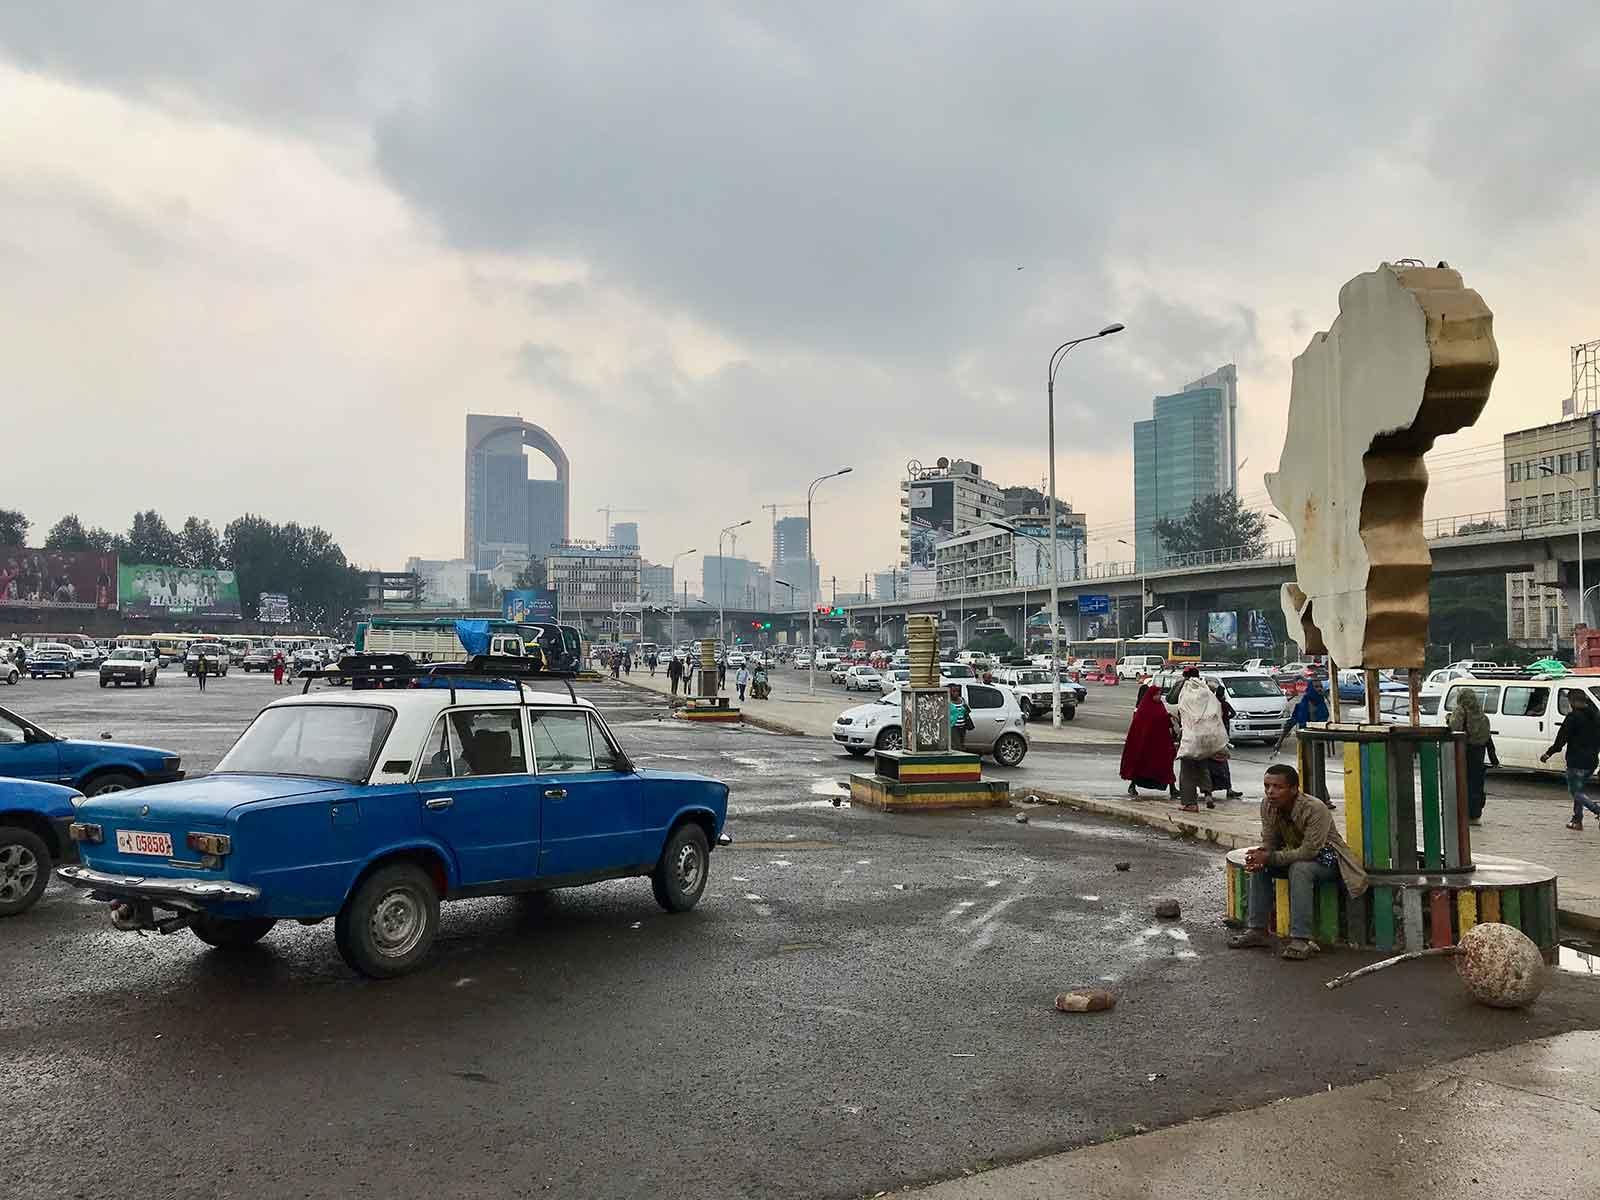 Alter historischer Platz in Addis Abeba - Meskel Square, Addis Ababa